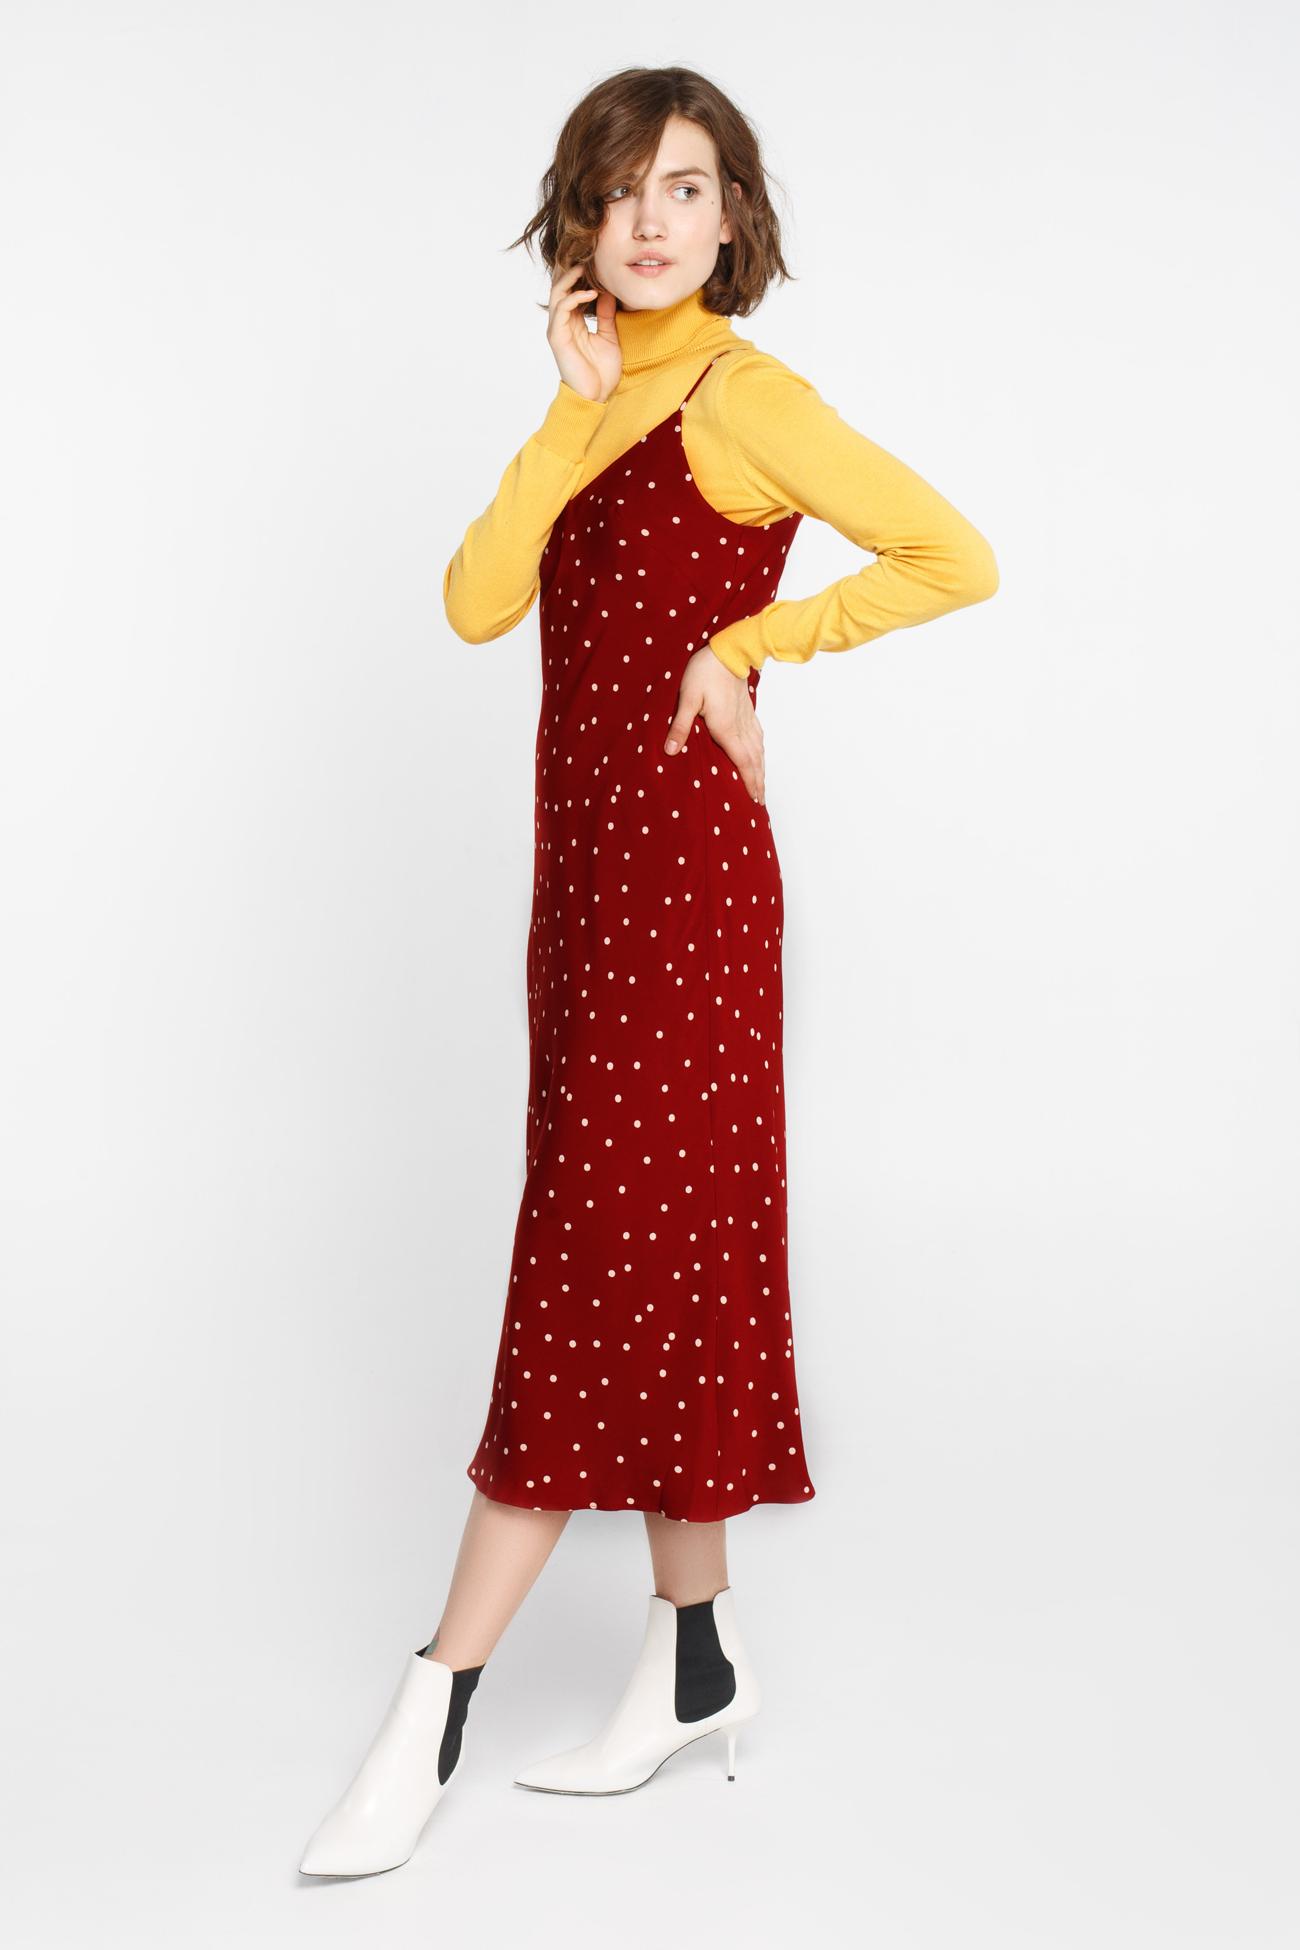 Сарафан женские MustHave модель 7281 купить, 2017